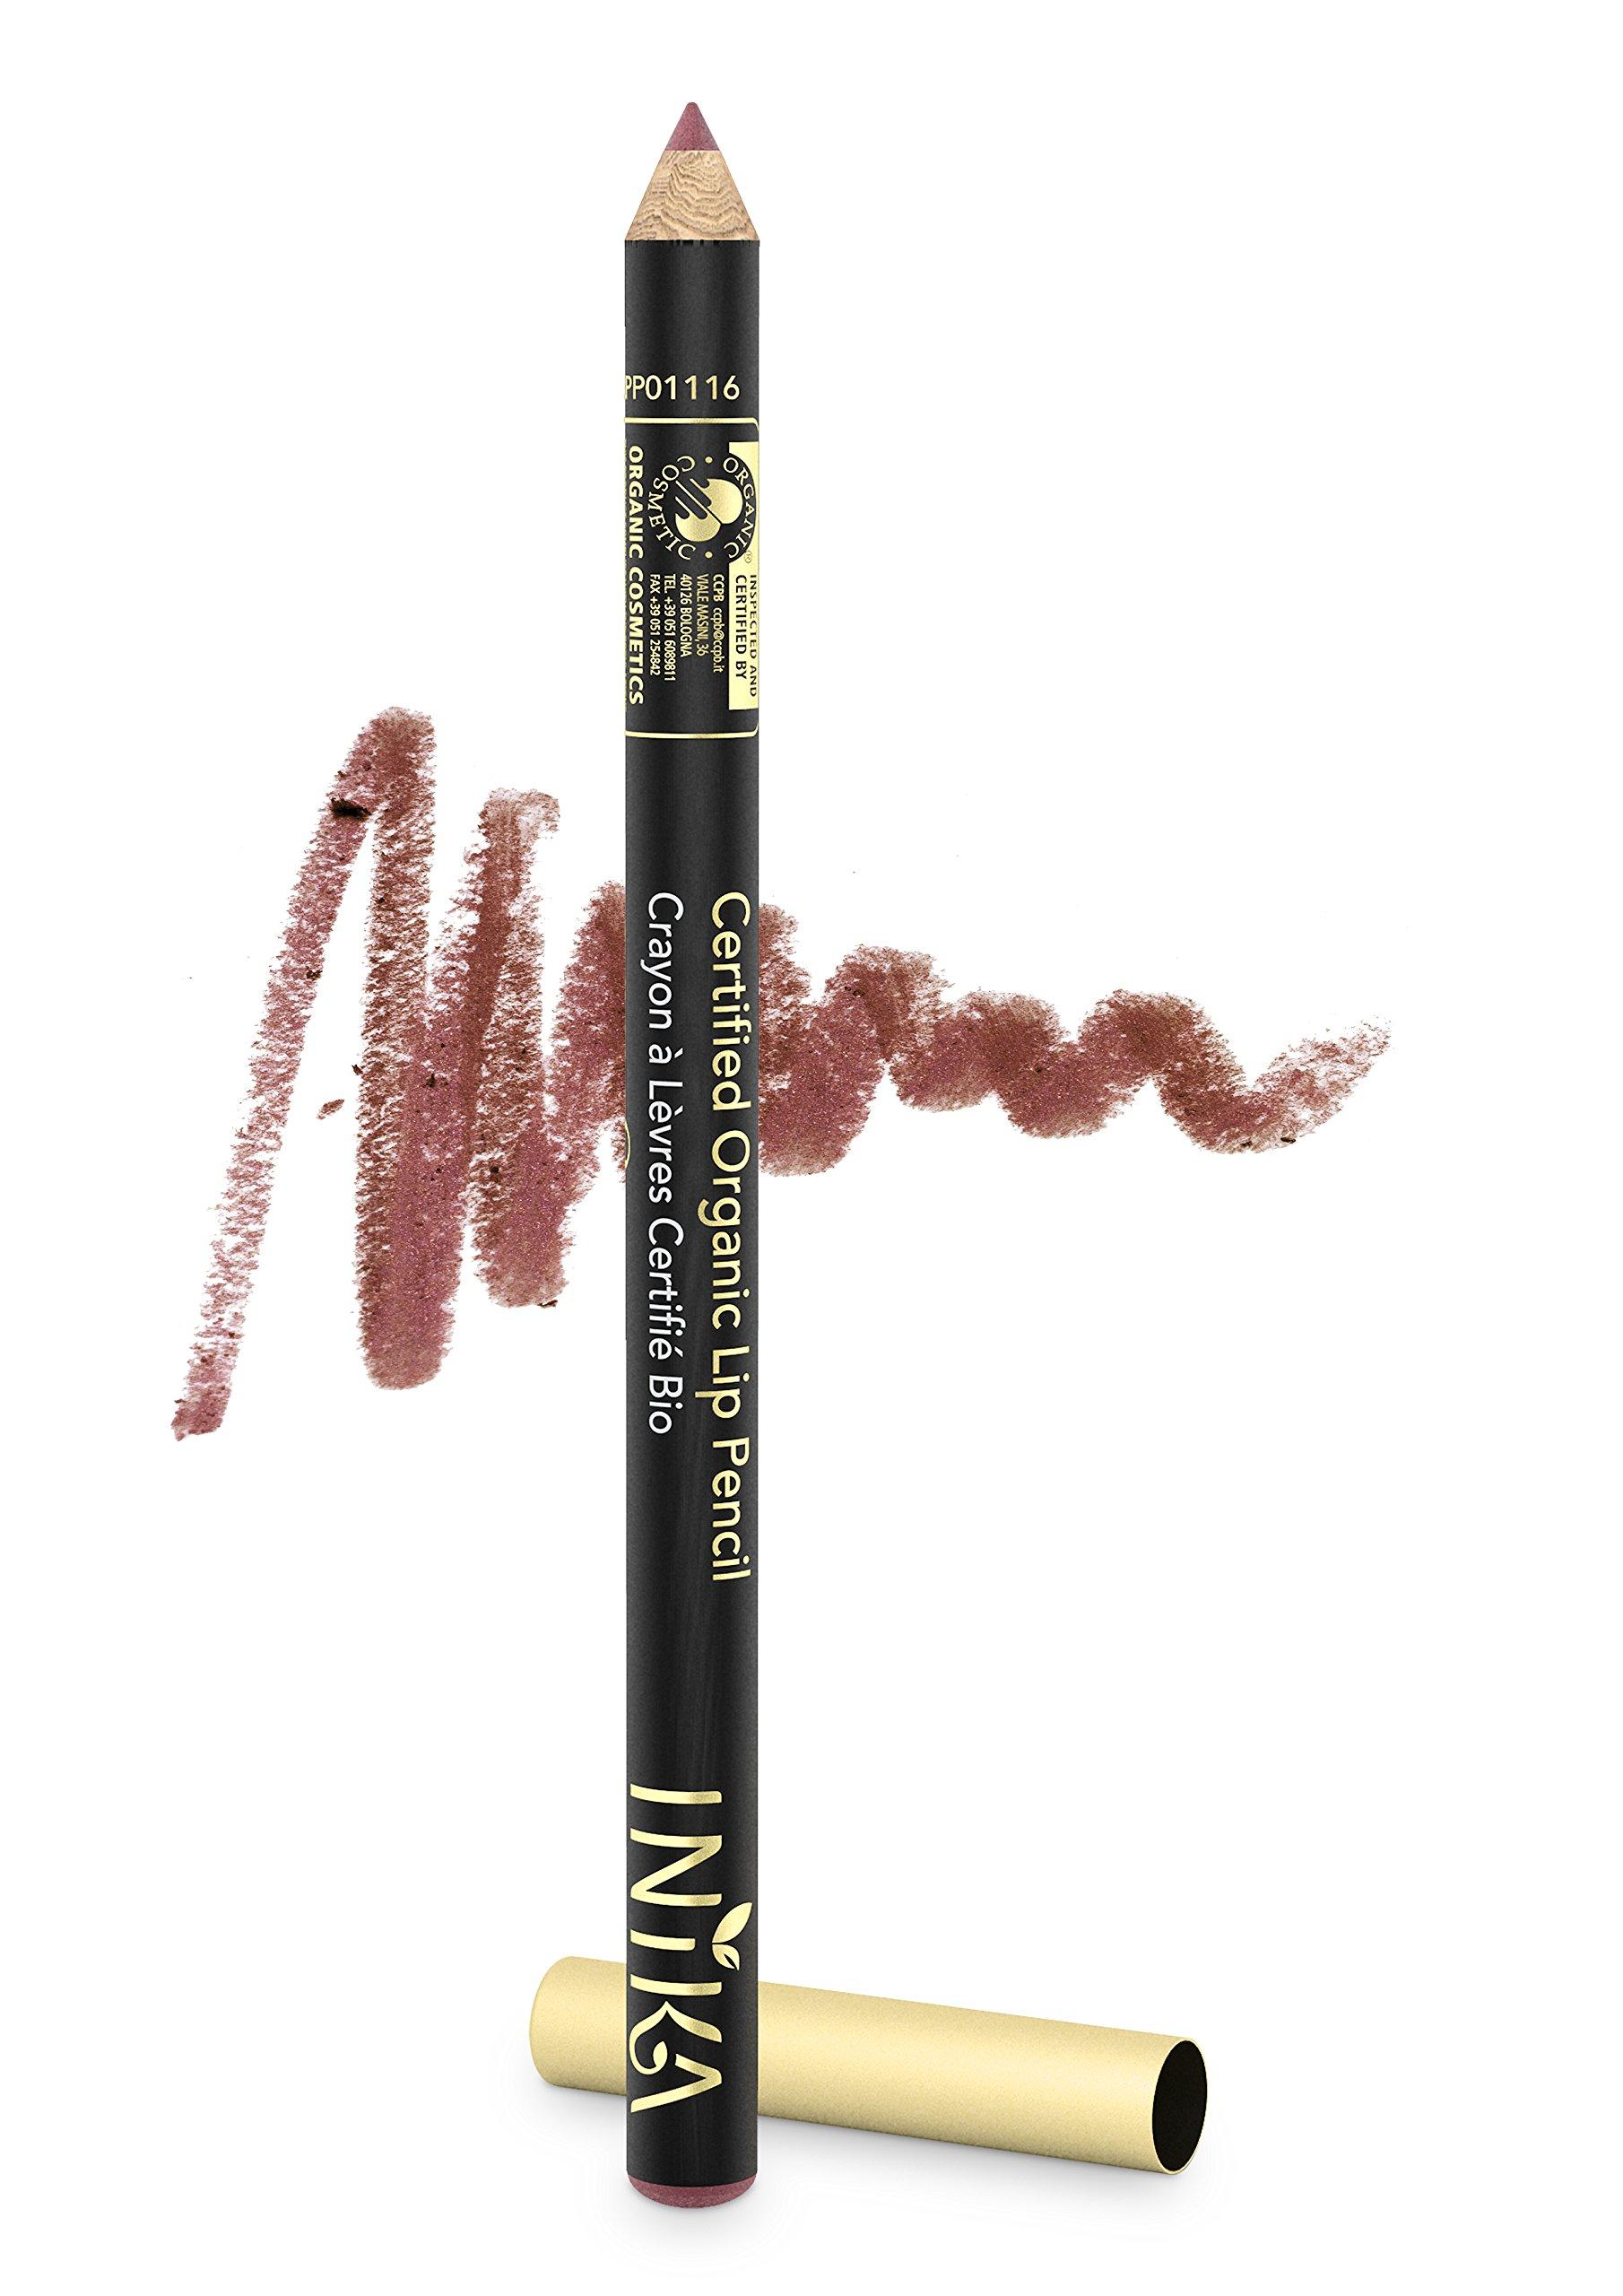 INIKA Certified Organic Lip Liner Pencil, All Natural Formula, Vegan, Rich, Creamy Formula, Suits Sensitive Eyes, 1.2g (Safari)